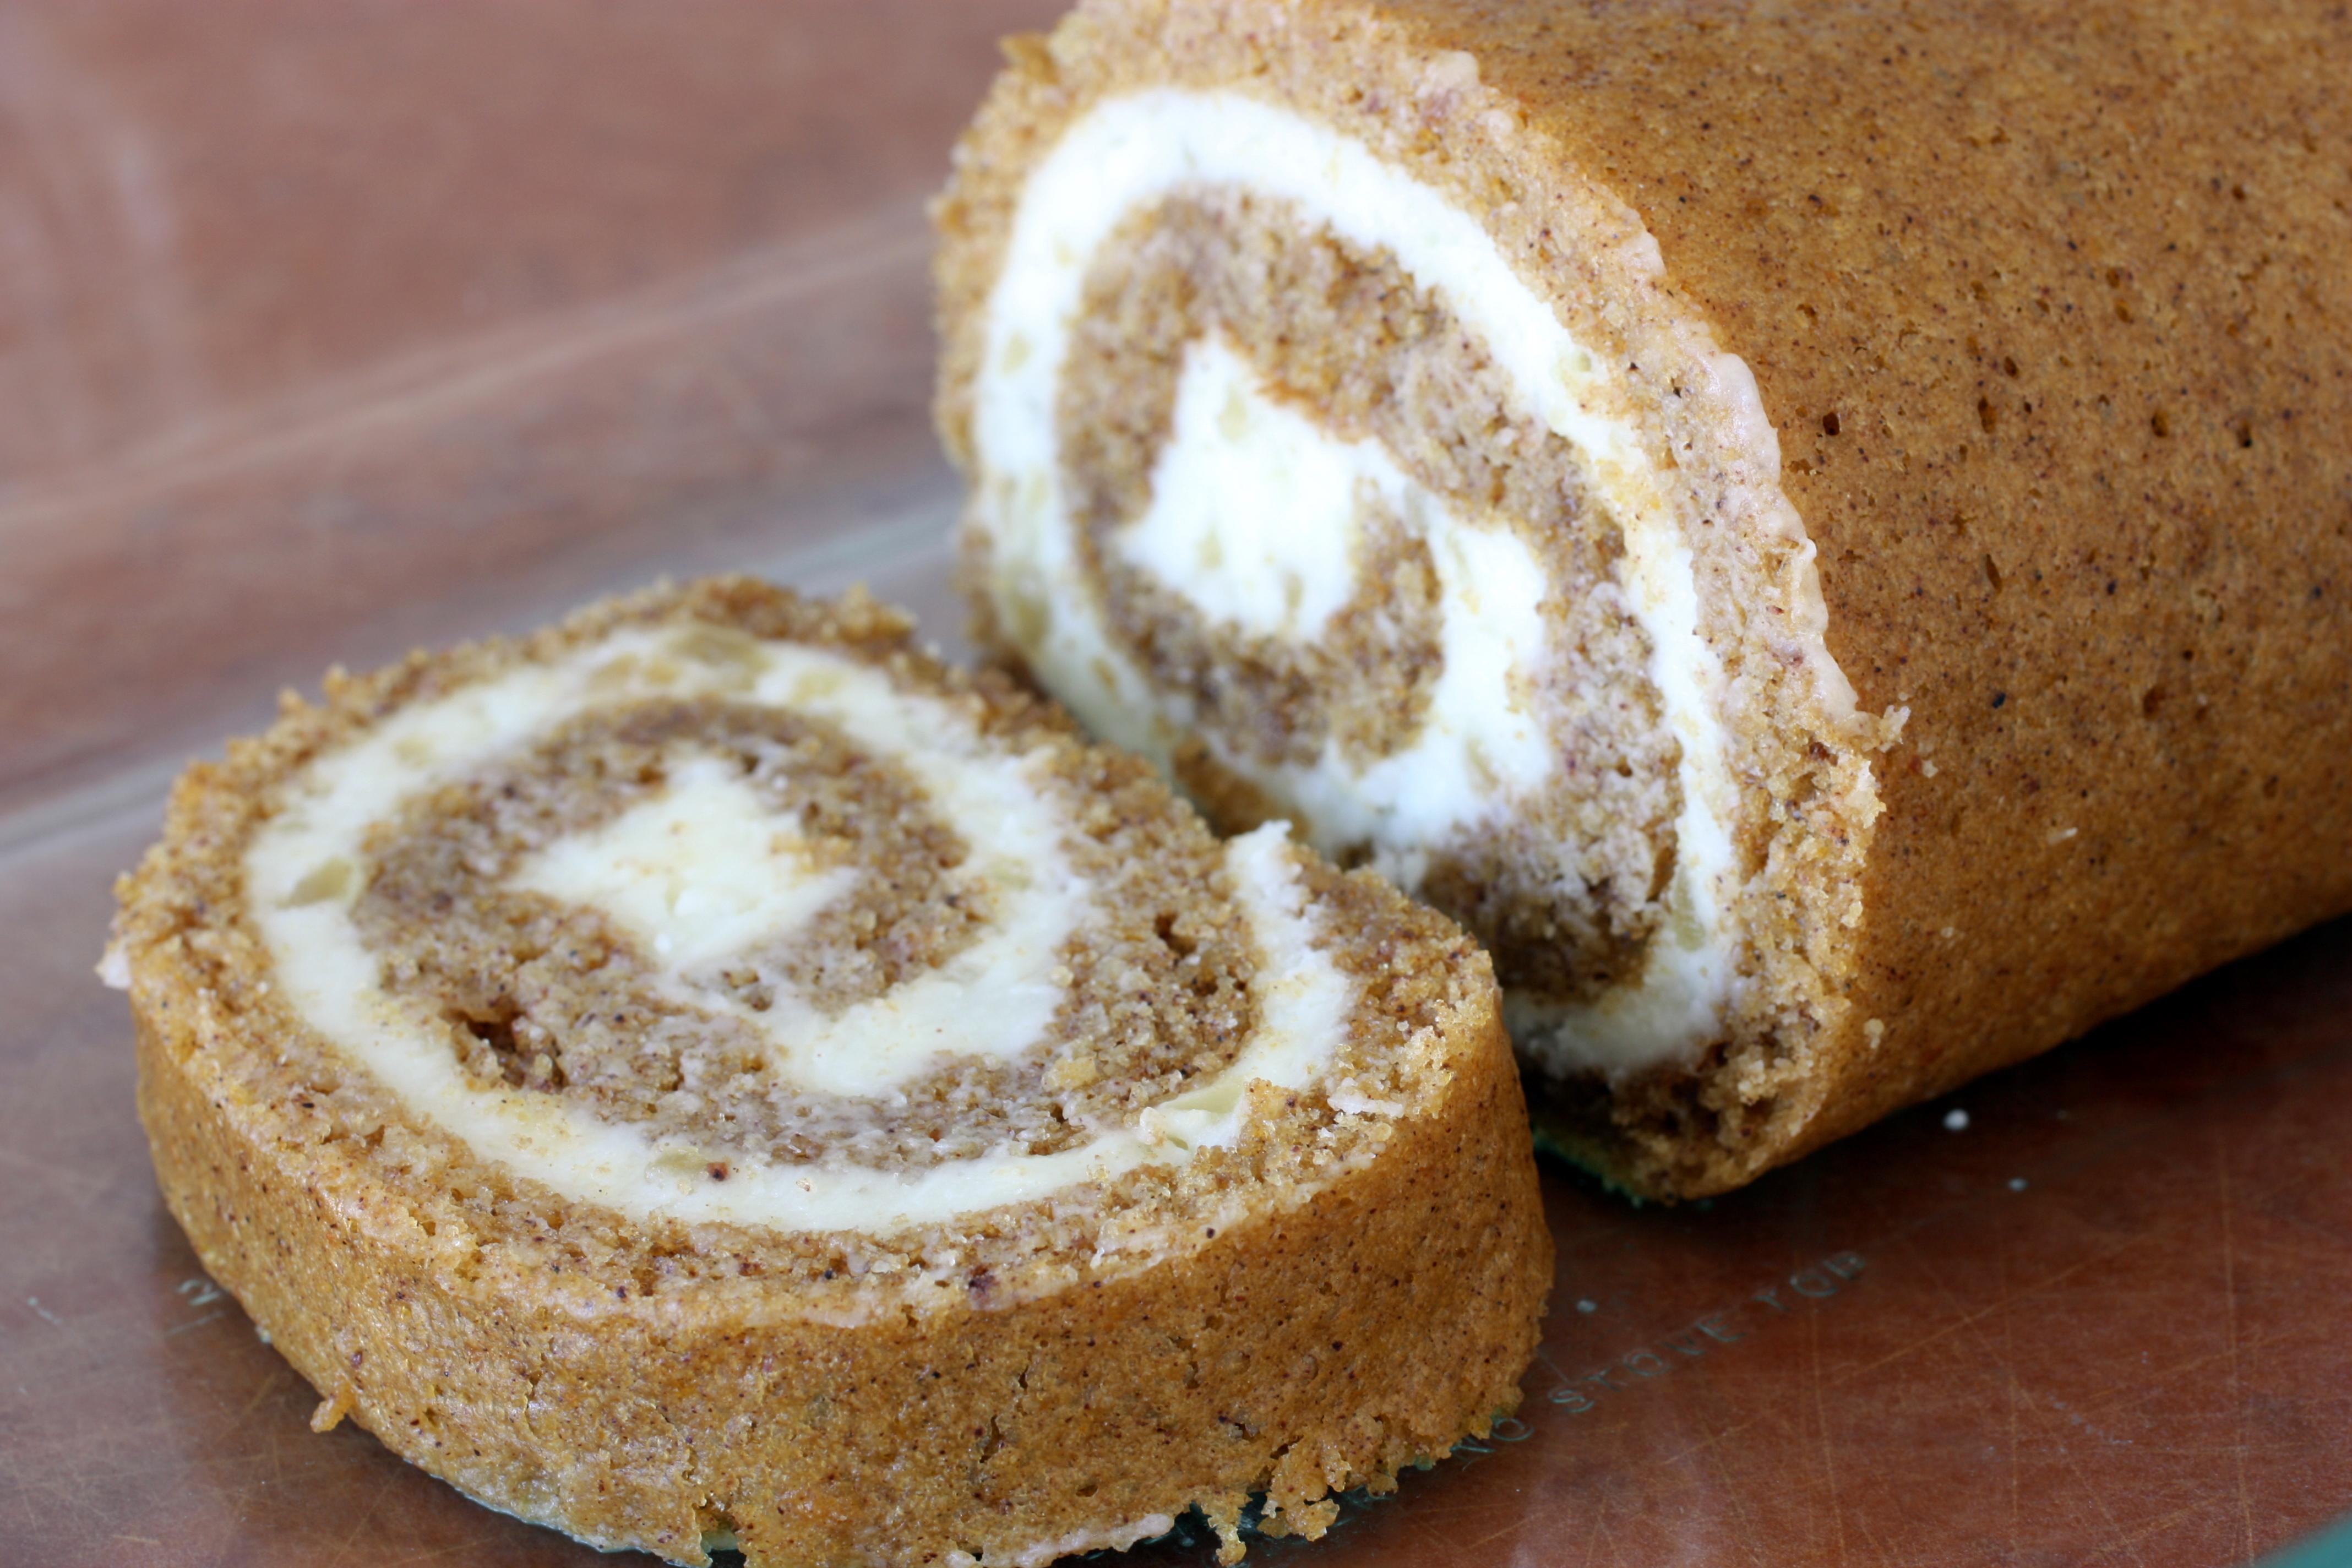 Ina Garten Pumpkin Bread Adorable Of Pumpkin Roulade with Ginger Buttercream Images